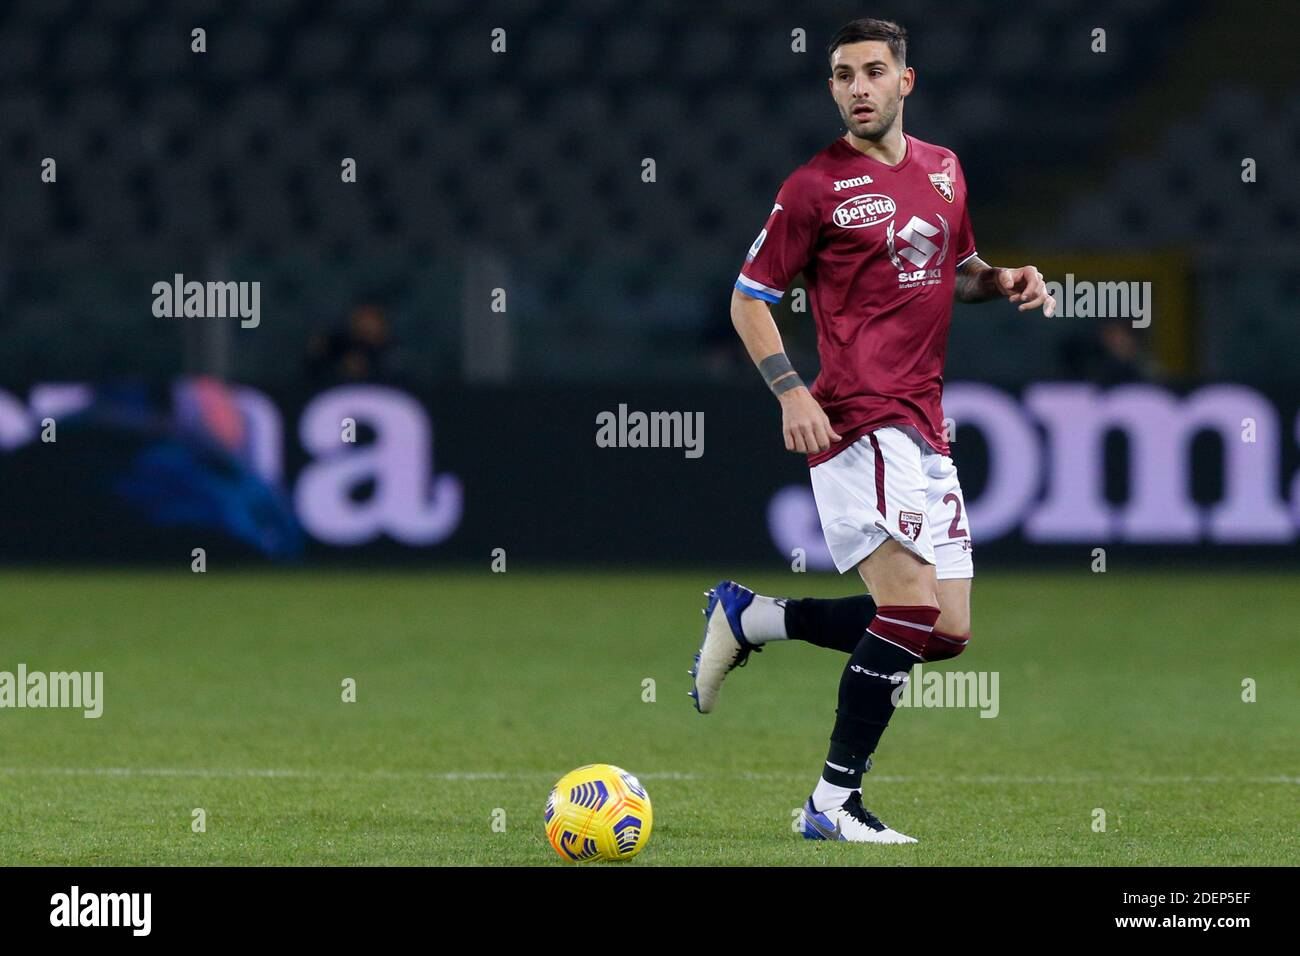 Nicola Murru (Torino FC) during Torino FC vs UC Sampdoria, Italian football Serie A match, Turin, Italy, 30 Nov 20 - Photo .LM/Francesco Scaccianoce Stock Photo